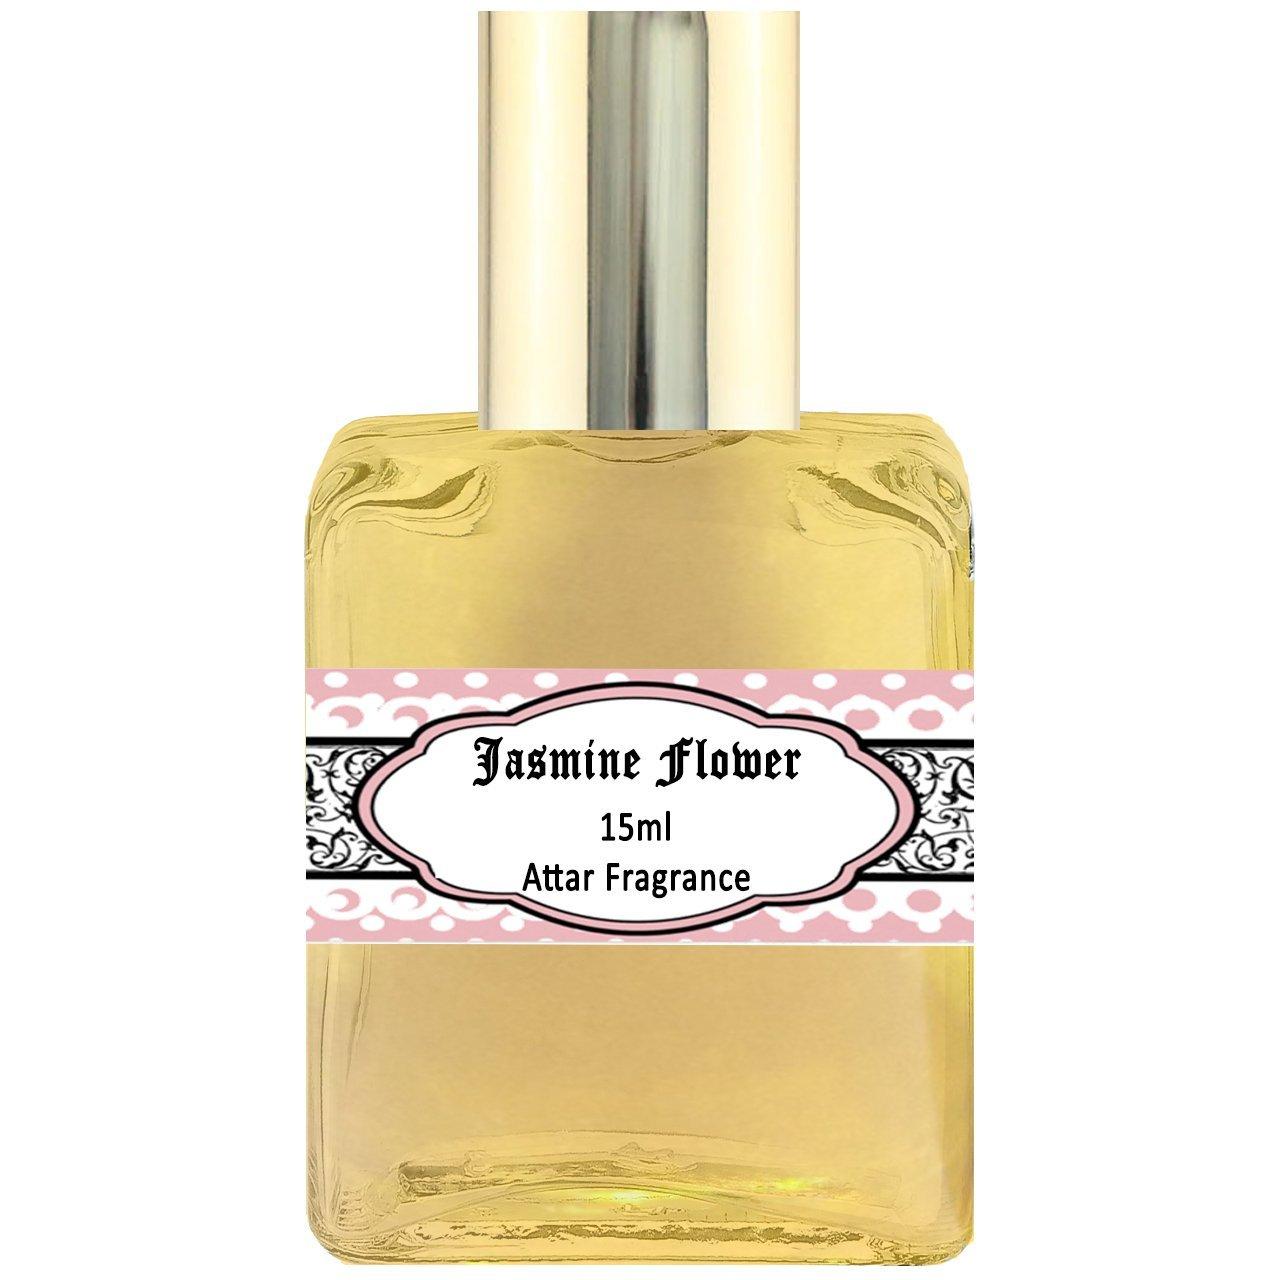 Cheap jasmine flower fragrance find jasmine flower fragrance deals get quotations jasmine flower attar ittar fragrance 15ml izmirmasajfo